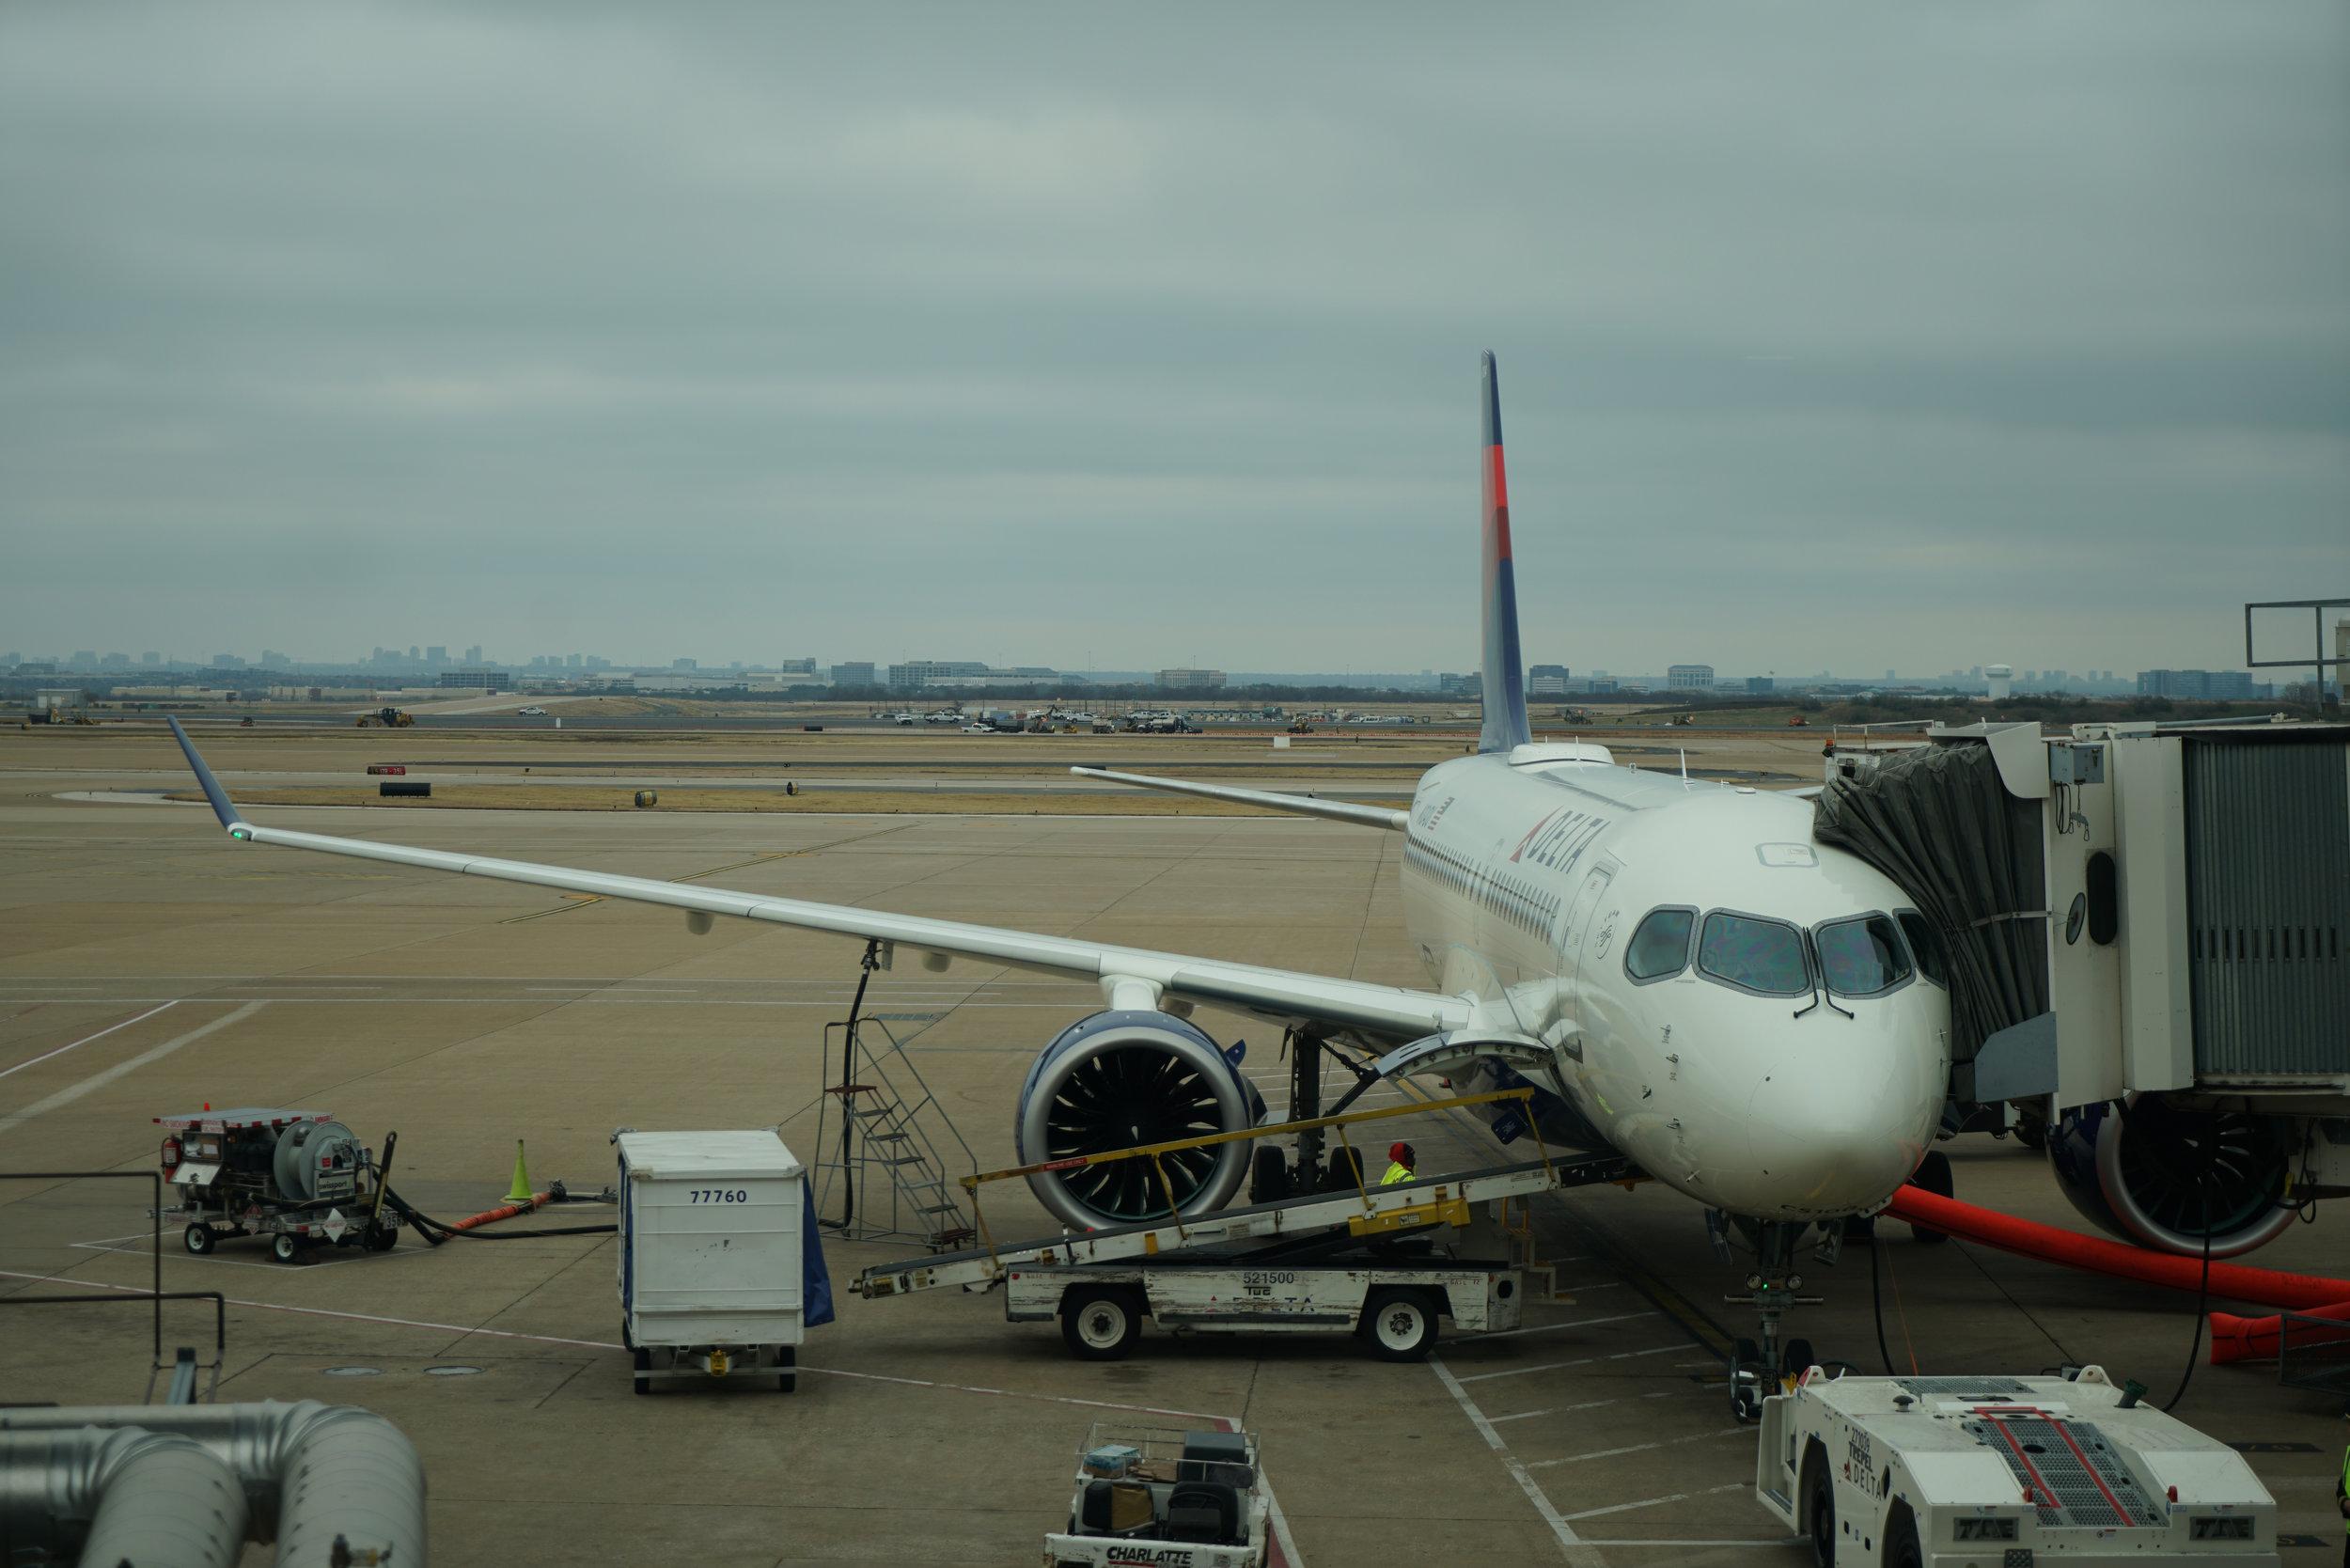 Delta A220 at DFW Gate.jpg